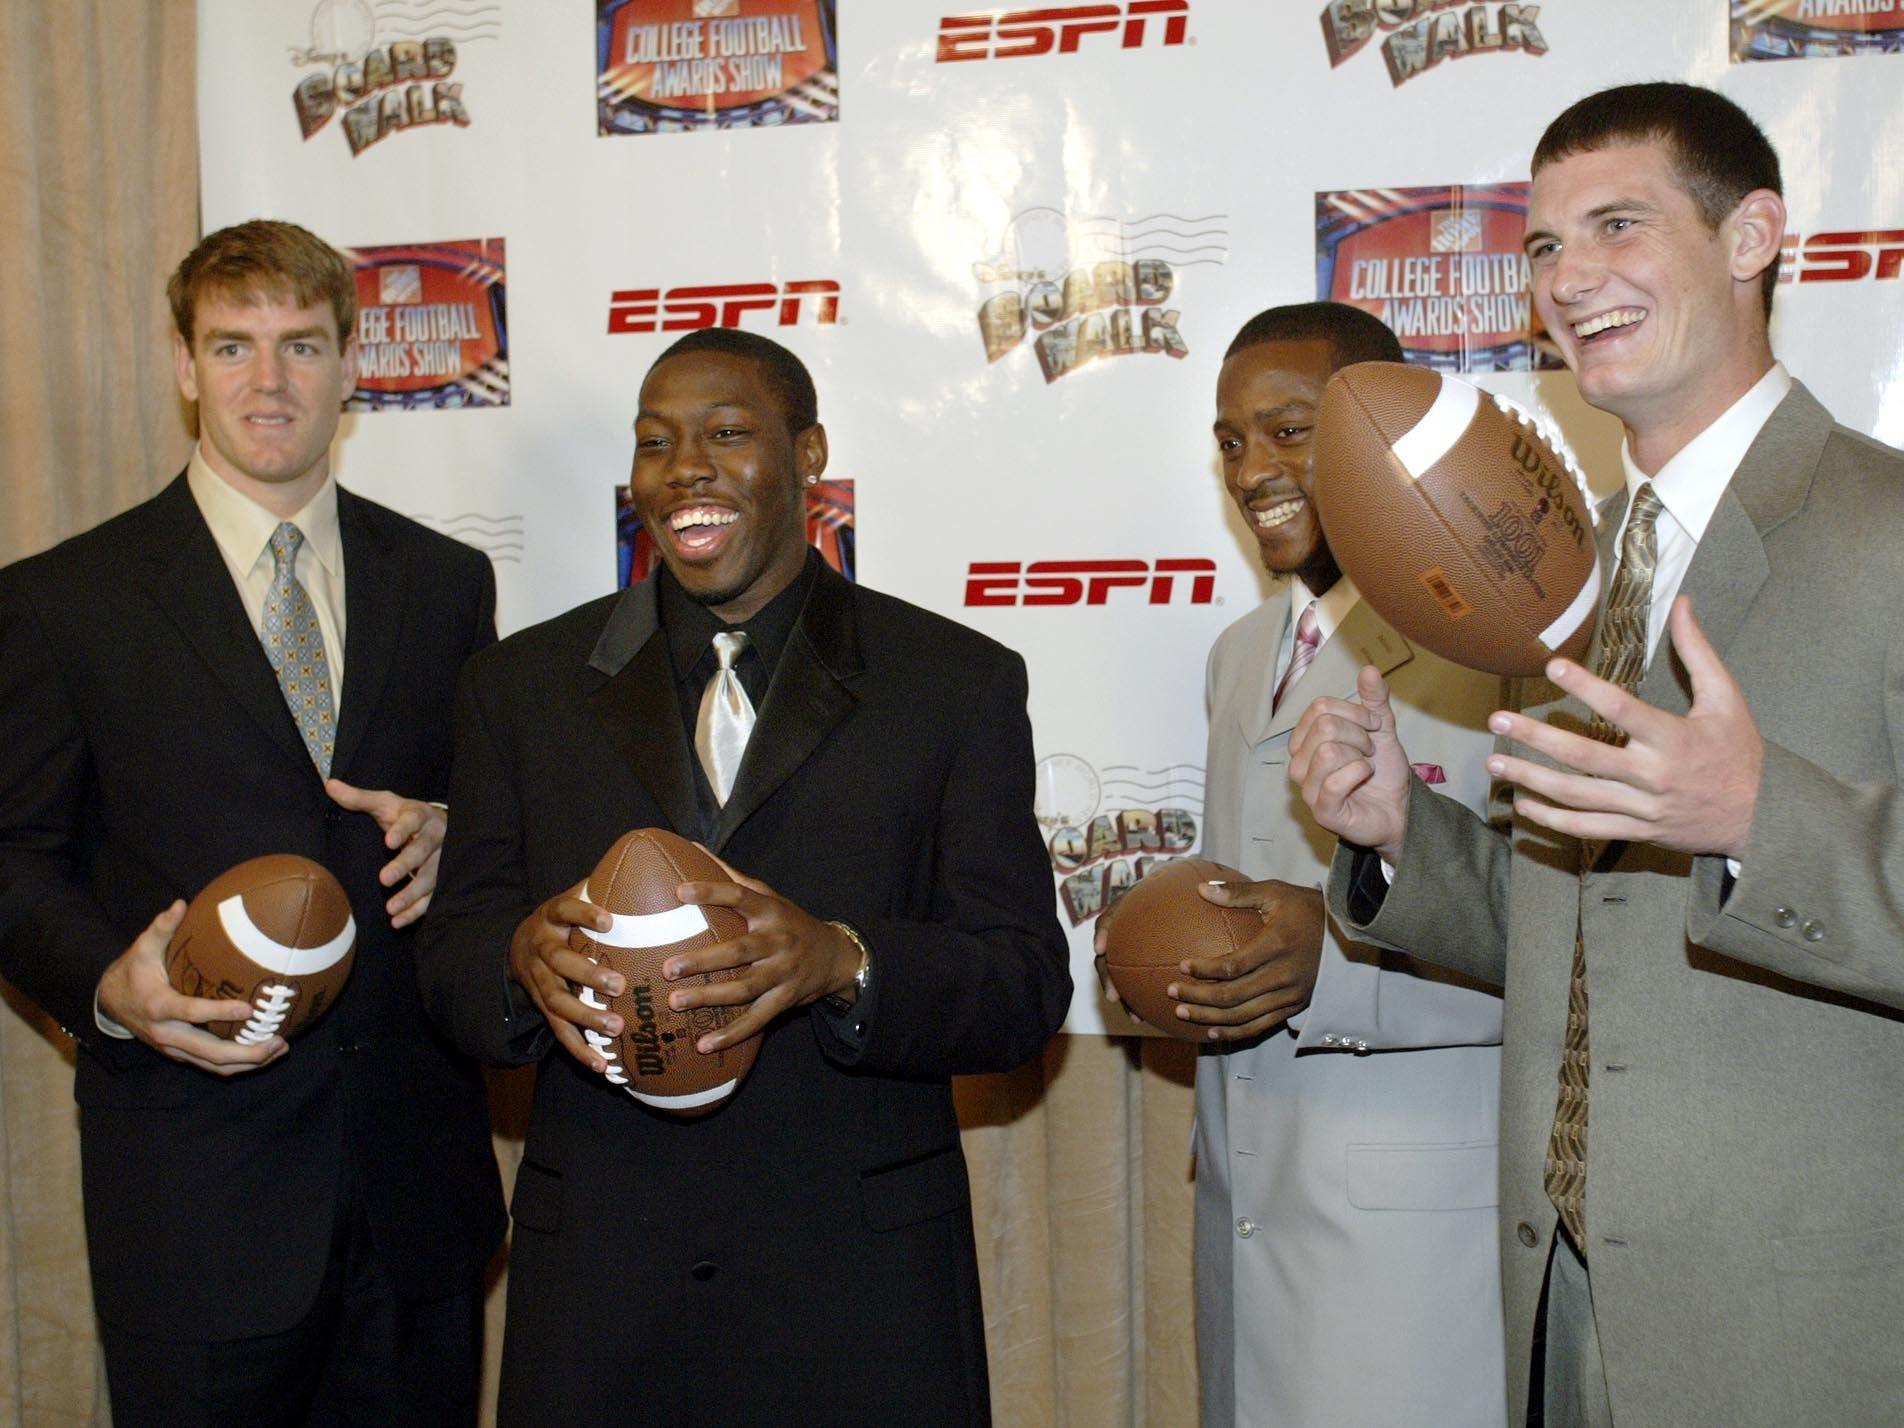 From 2002: From left, USC quarterback Carson Palmer, Iowa quarterback Brad Banks, Miami running back Willis McGahee and Miami quarterback Ken Dorsey post together at the 2002 Home Depot College Football Awards at the Atlantic Hall at the Walt Disney World Resort in Lake Buena Vista, Florida.